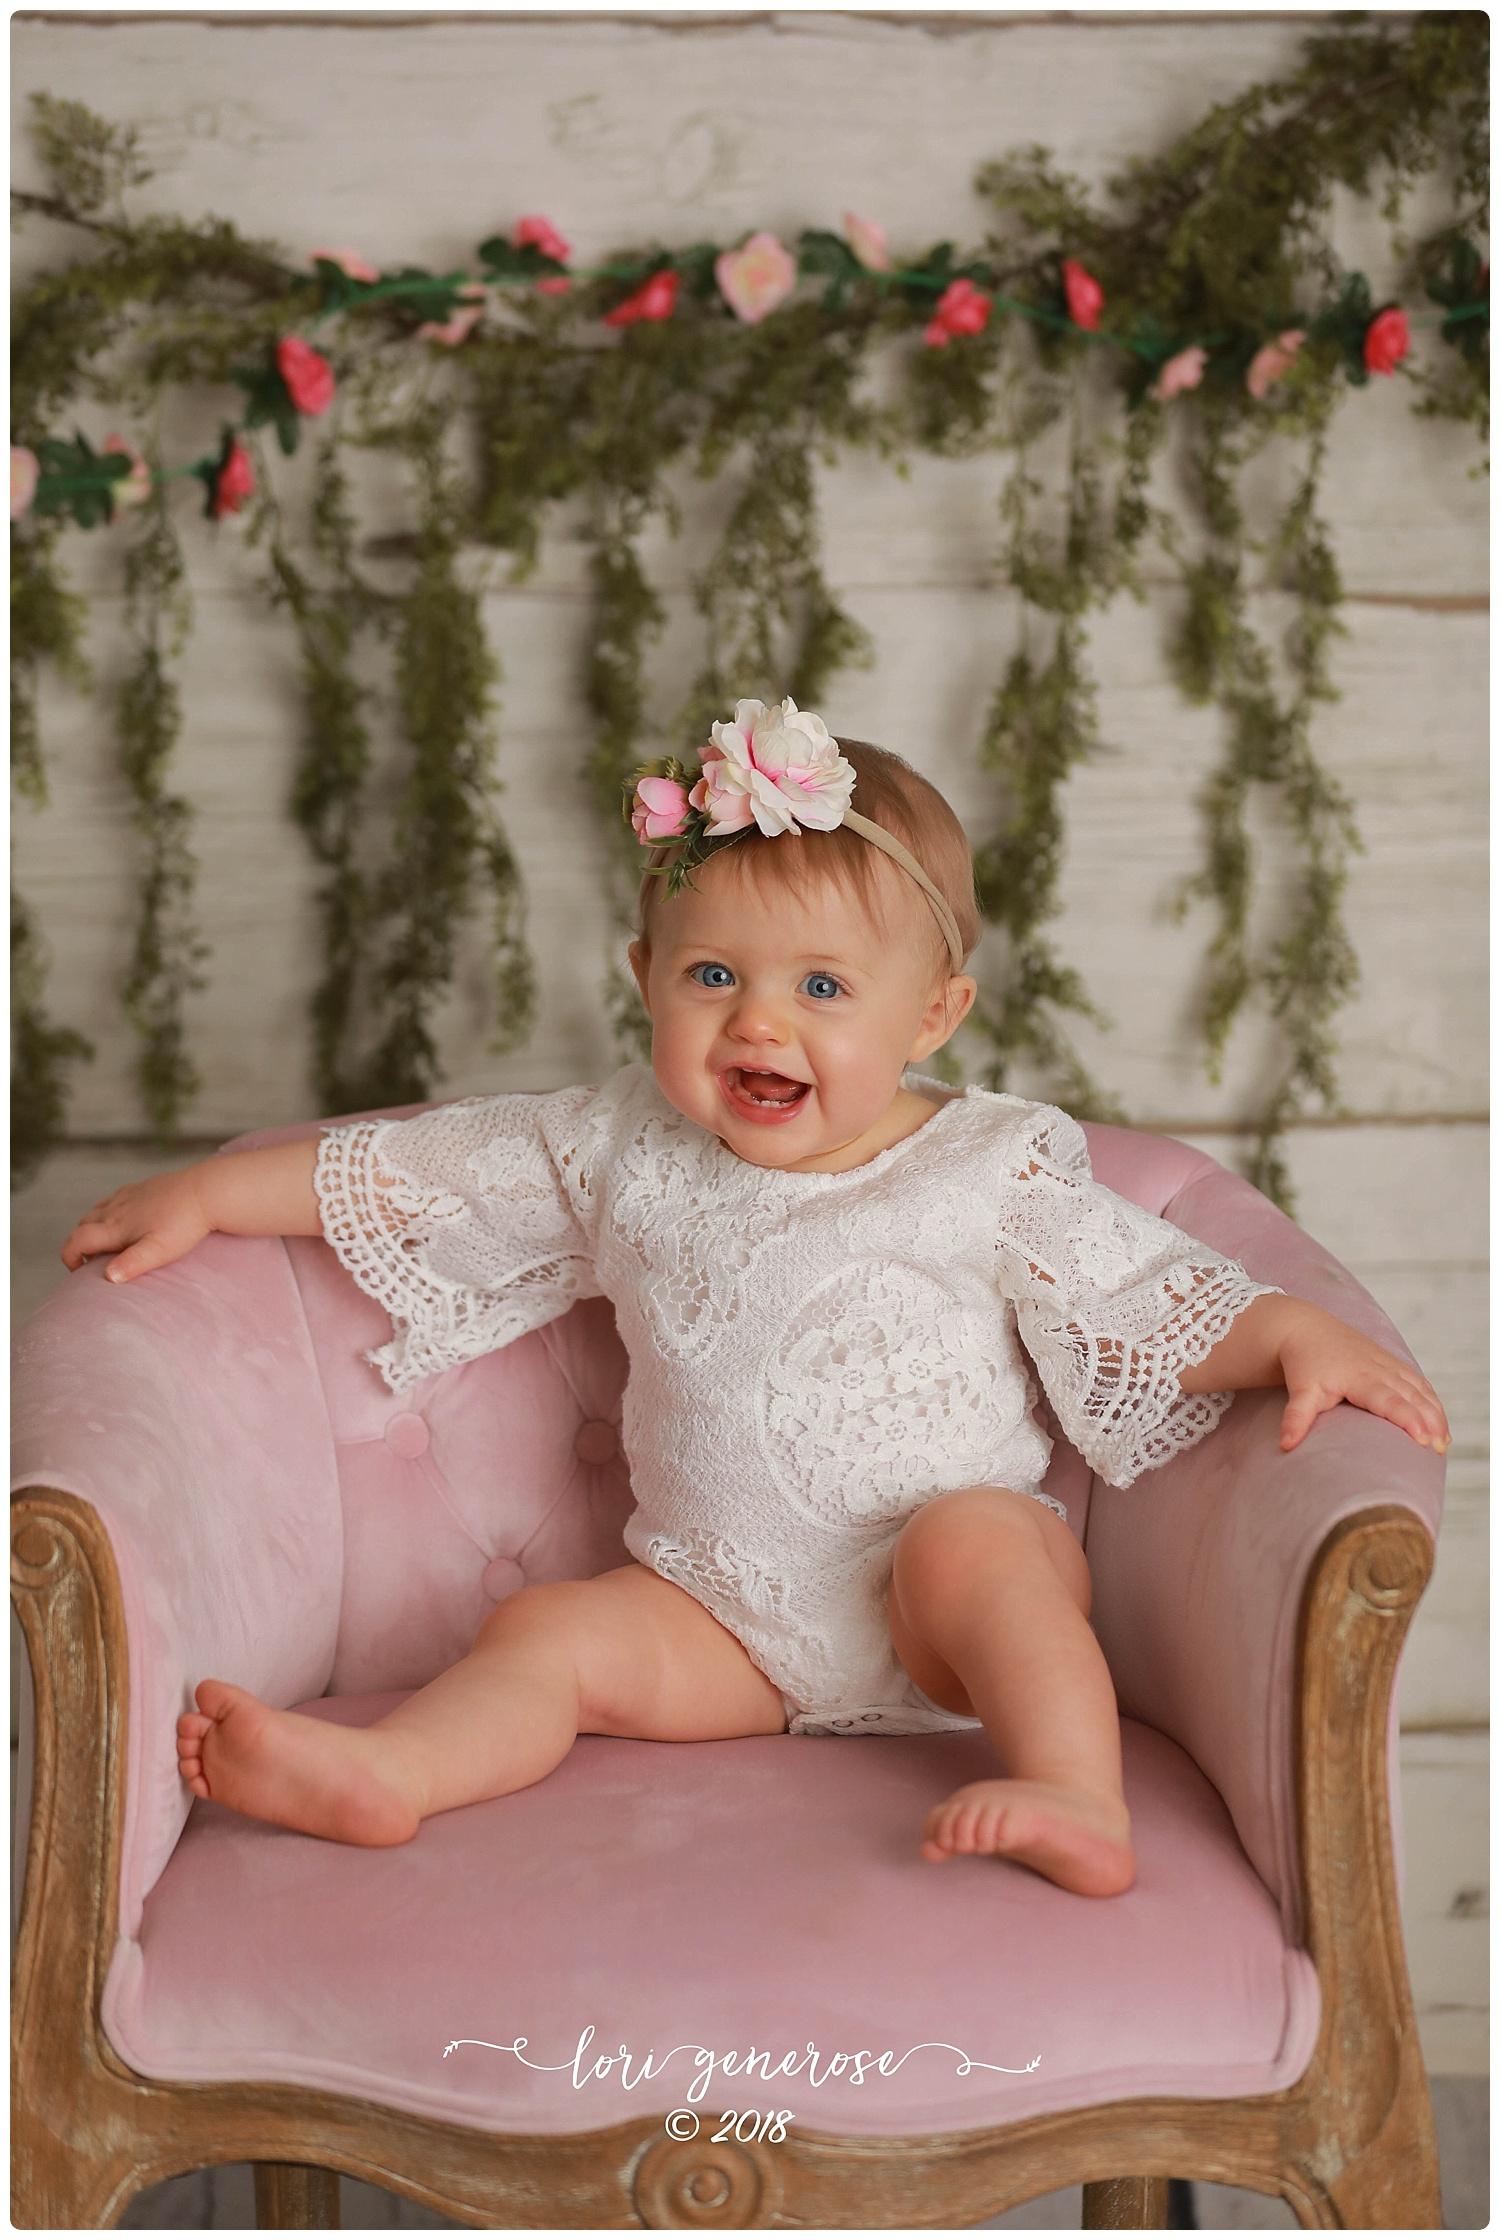 floralfirstbirthdayrosesgreenspinkchairlgphotography.jpg